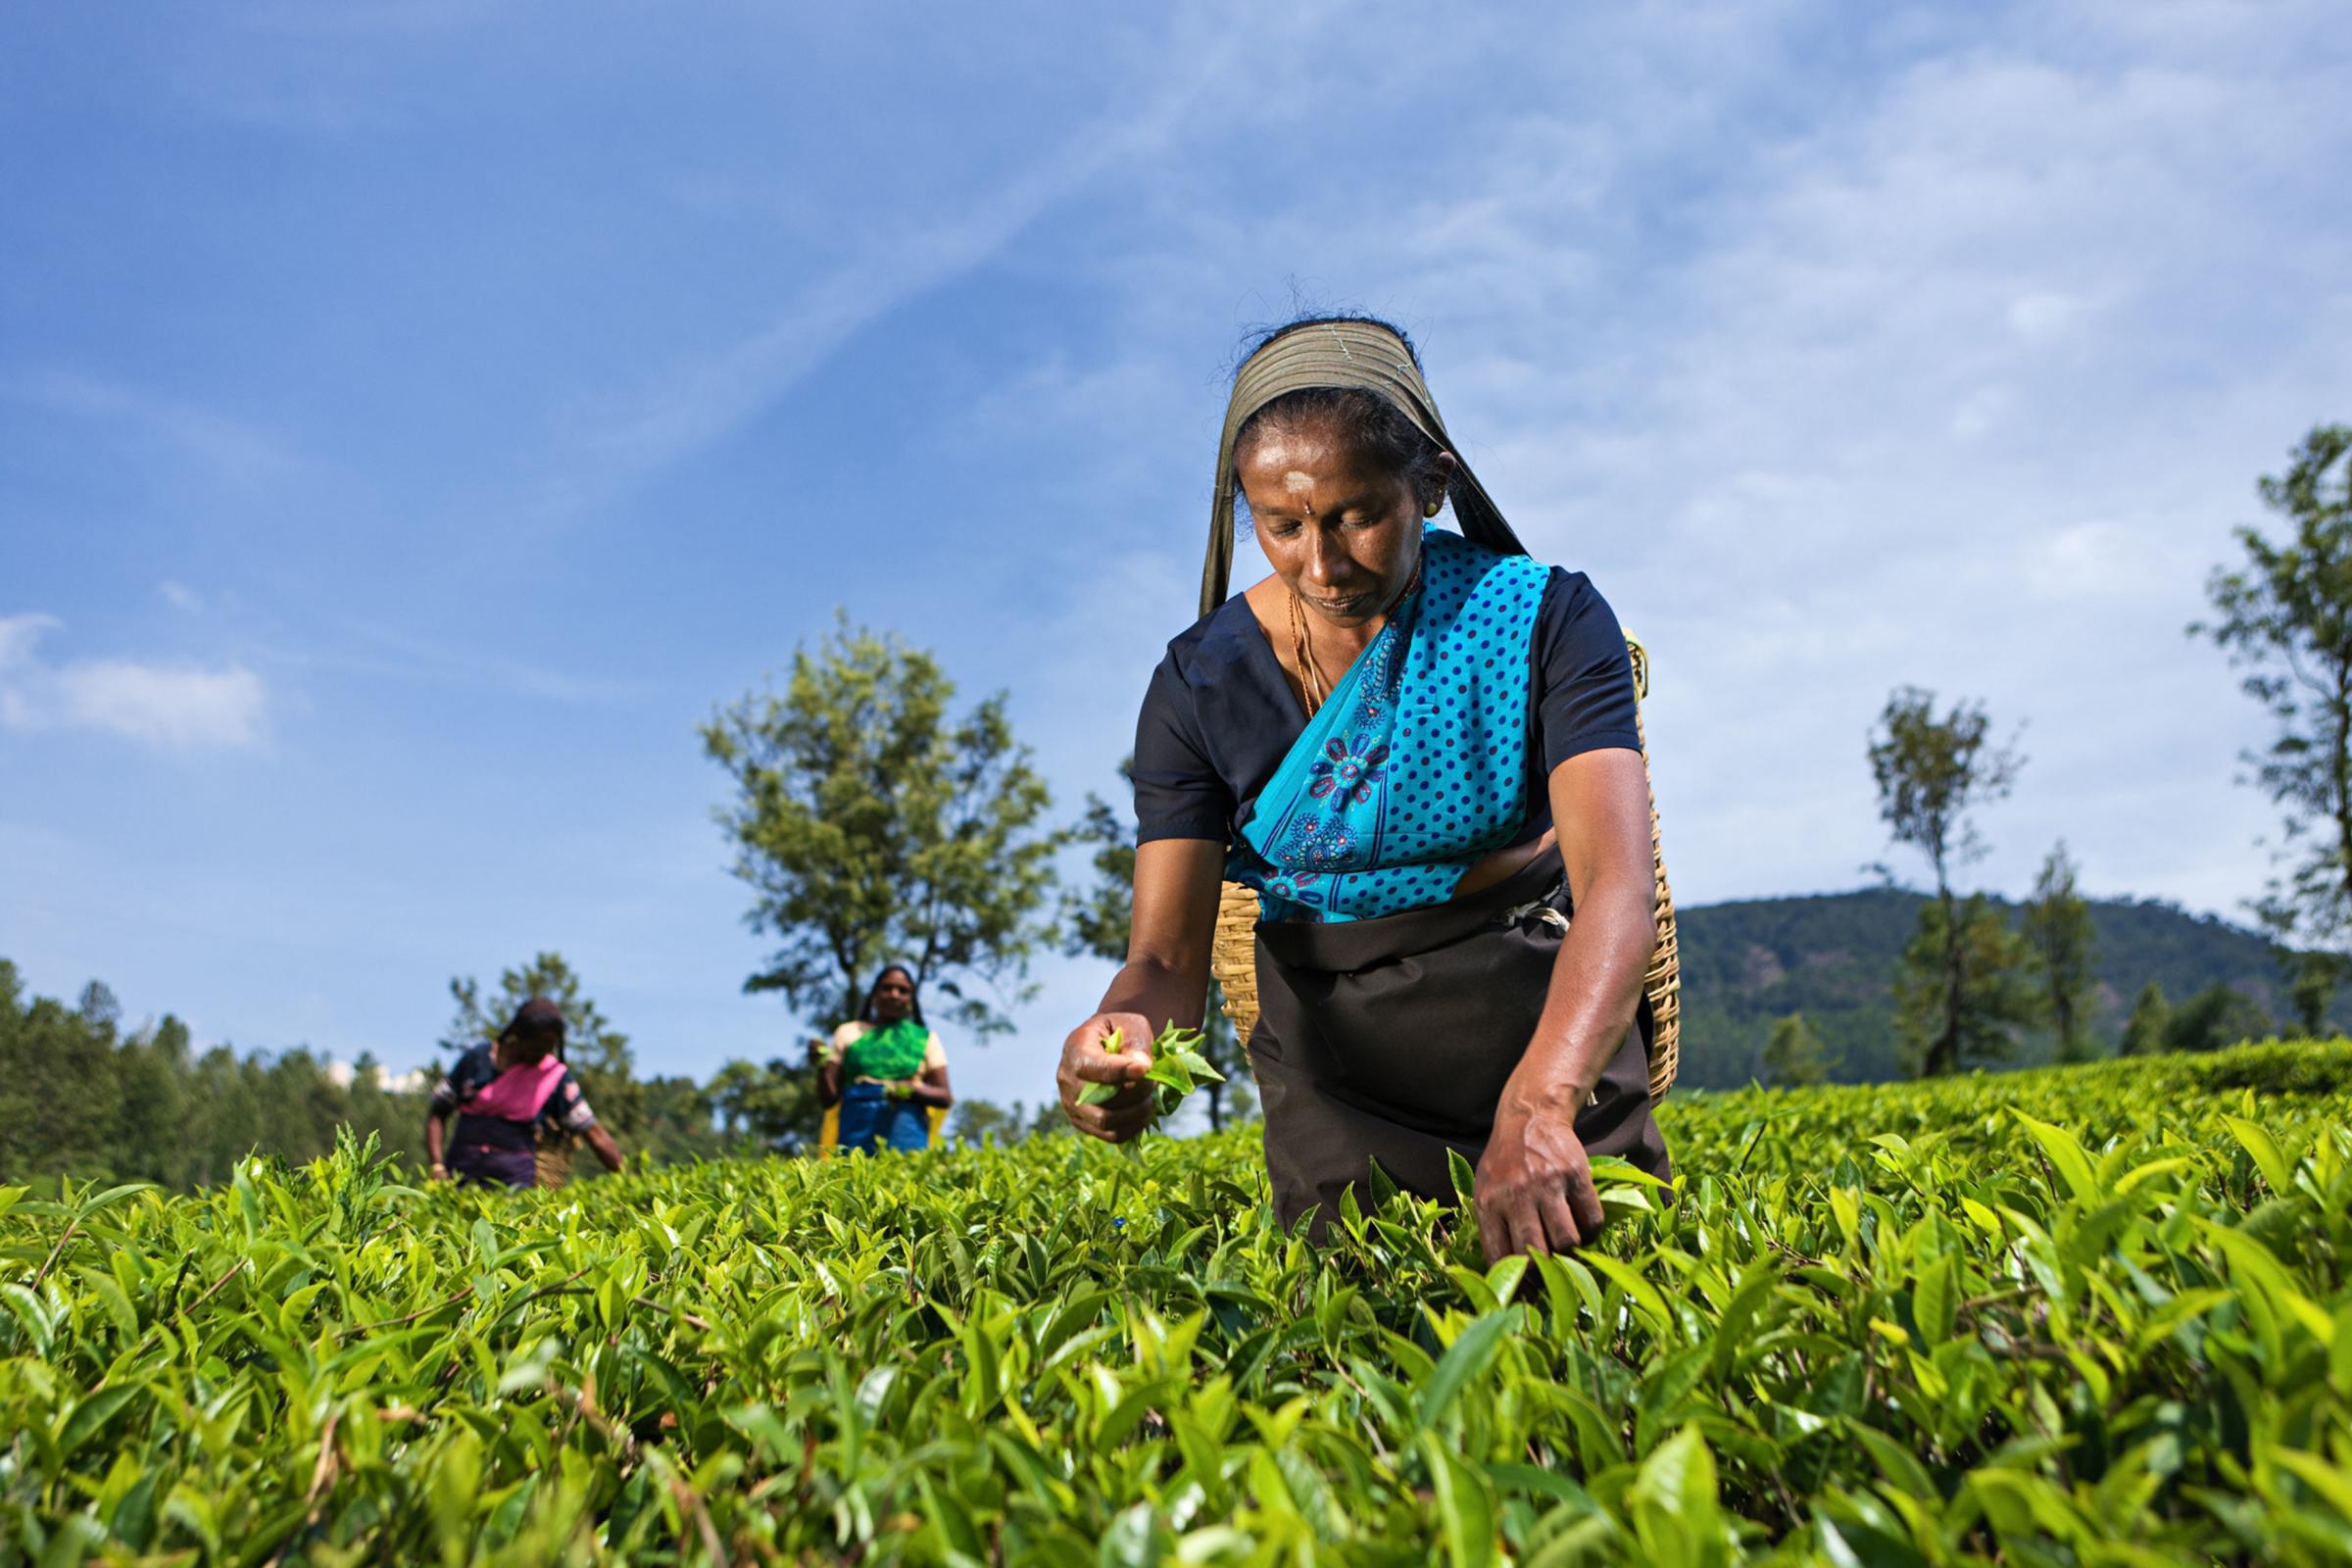 Travel: Taking tea with the true masters in Sri Lanka